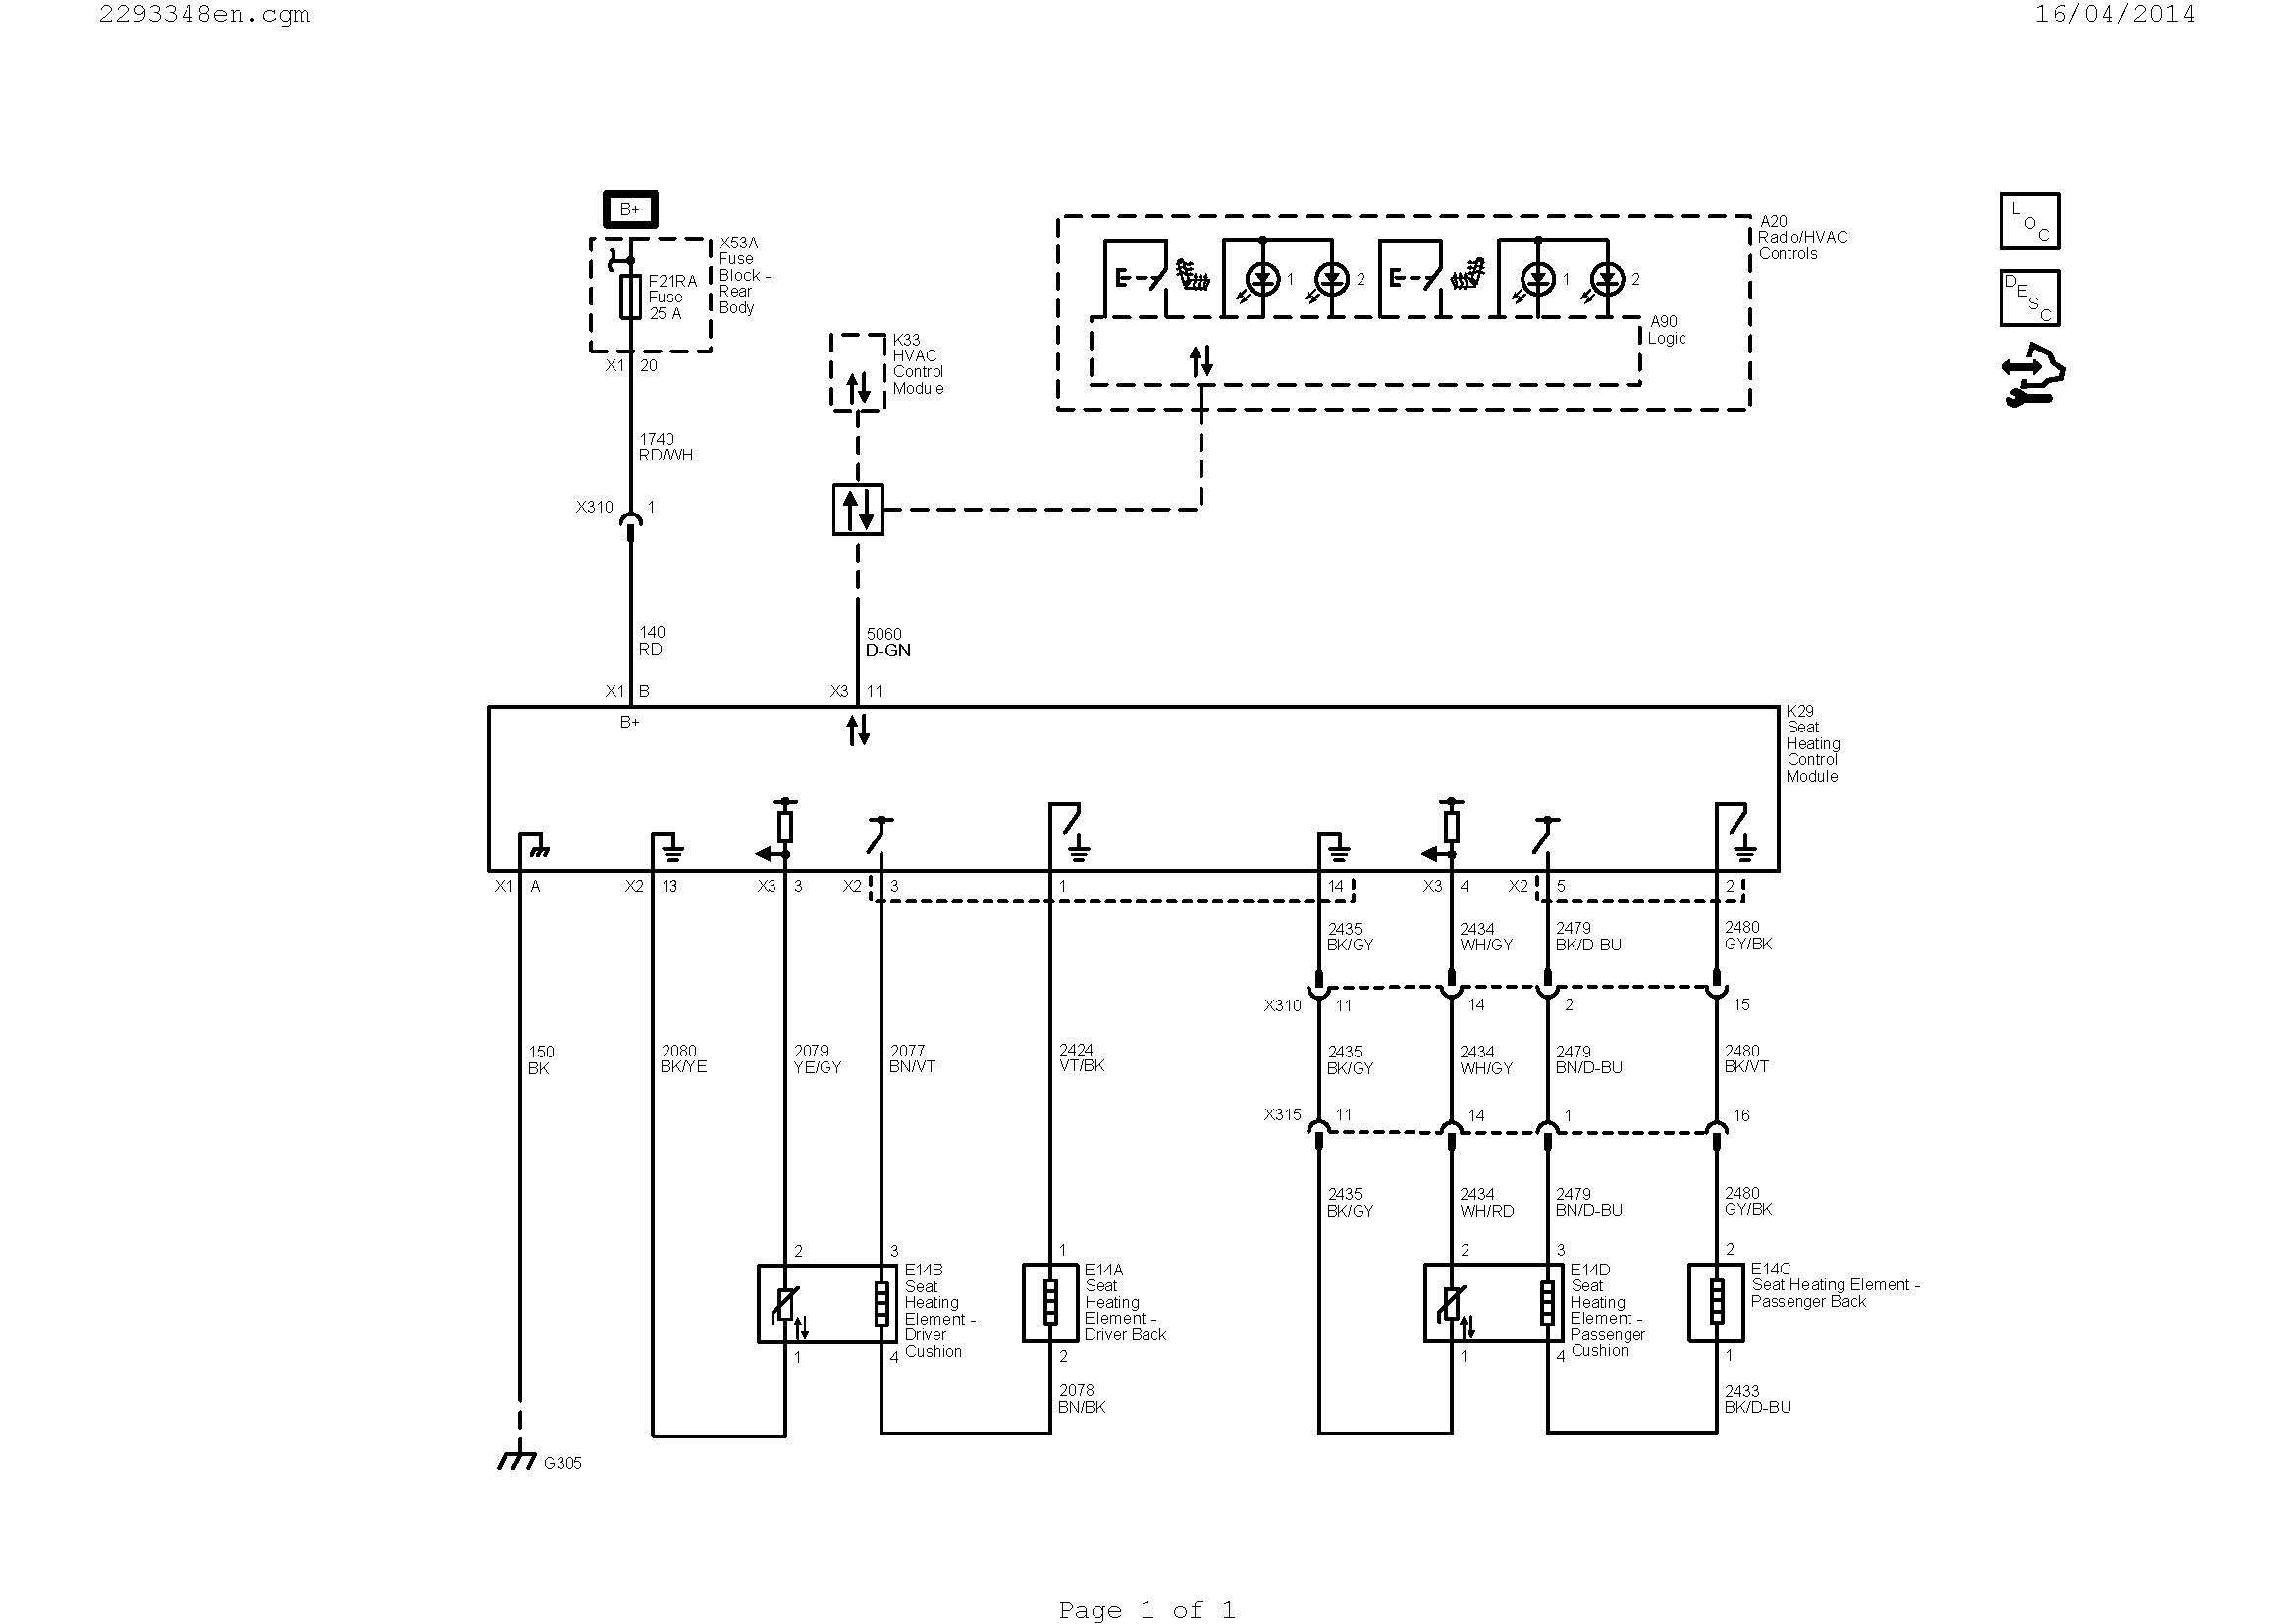 dometic comfort control center 2 wiring diagram Collection-Dometic fort Control Center 2 Wiring Diagram Wiring A Ac thermostat Diagram New Wiring Diagram 7-r